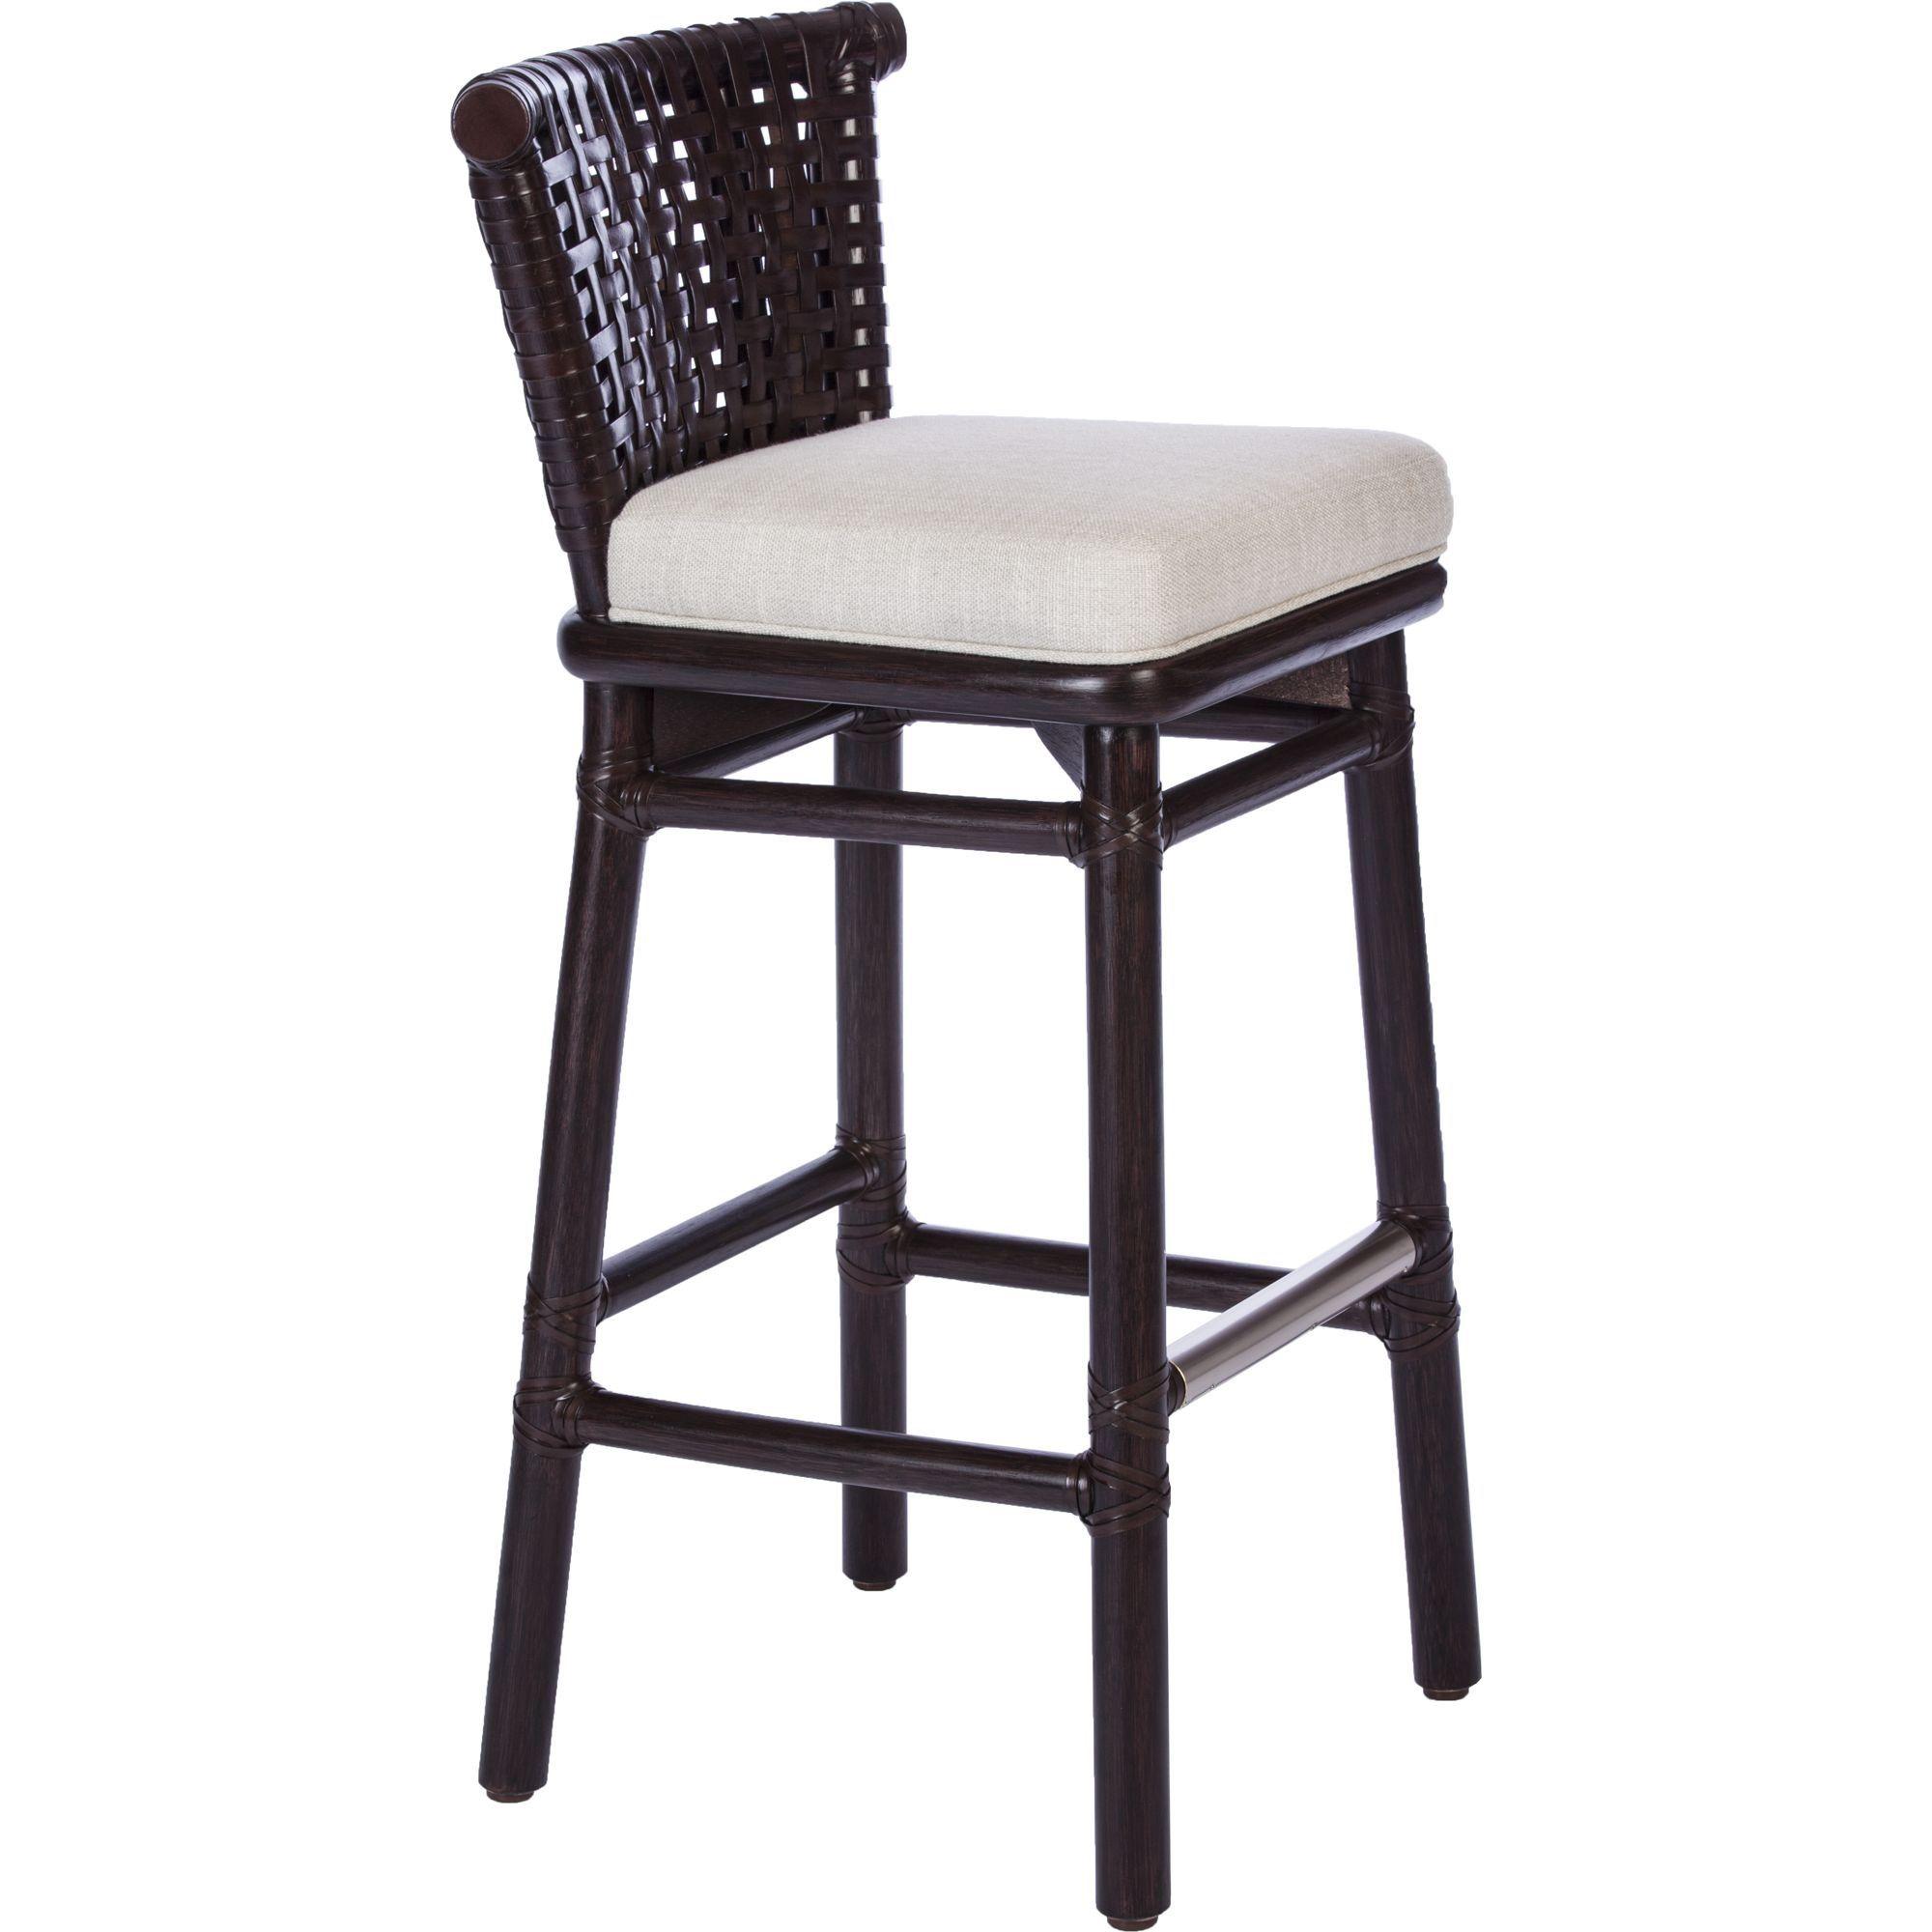 mcguire furniture company laced. Buy Antalya(TM) Laced Rawhide Counter Stool By McGuire Furniture - Quick Ship Designer Mcguire Company